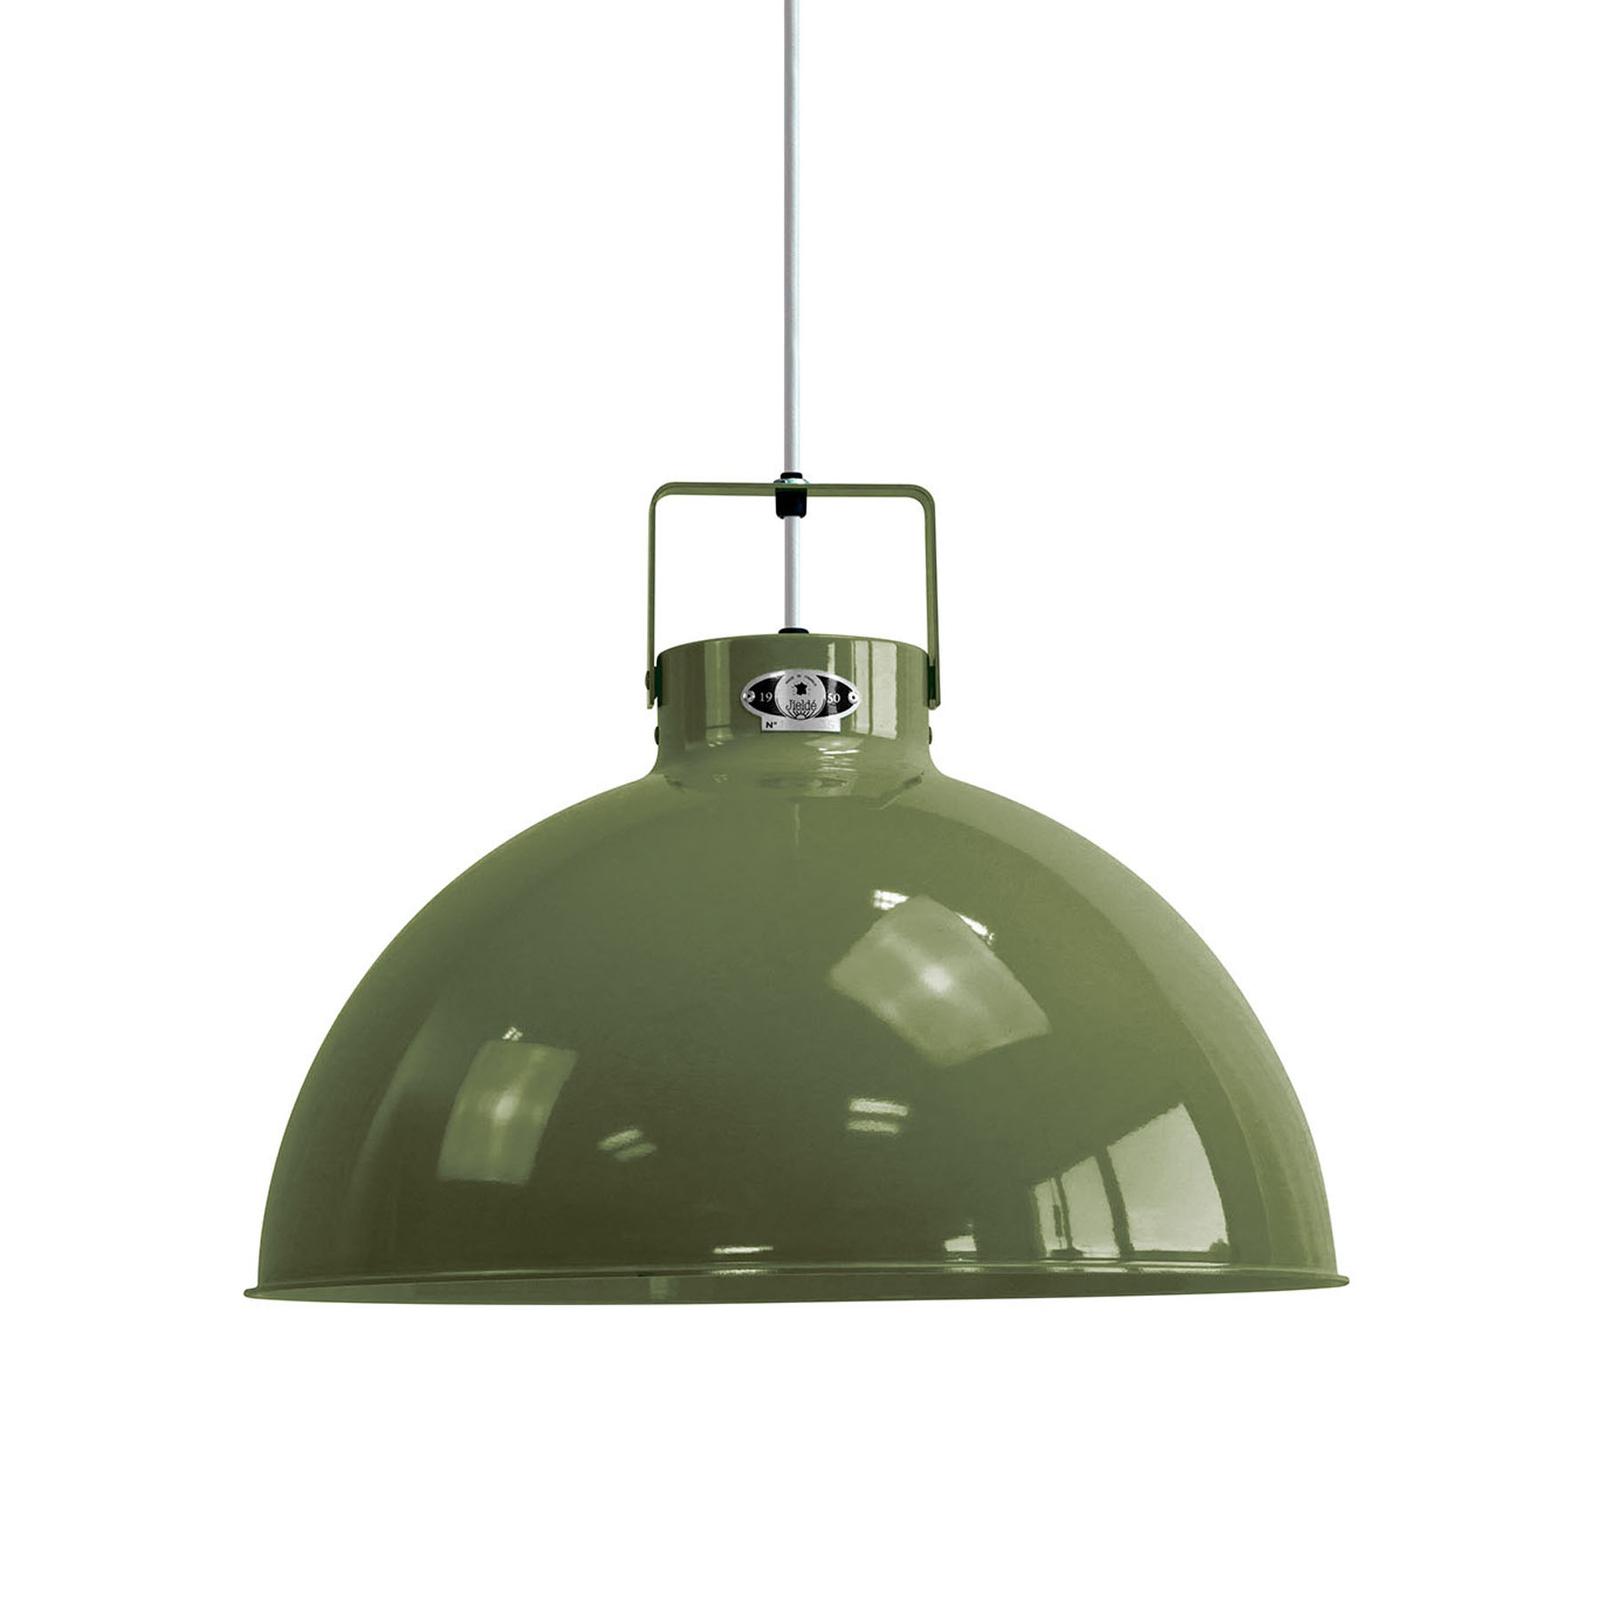 Jieldé Dante D450 Hängeleuchte, olivgrün, Ø 45 cm